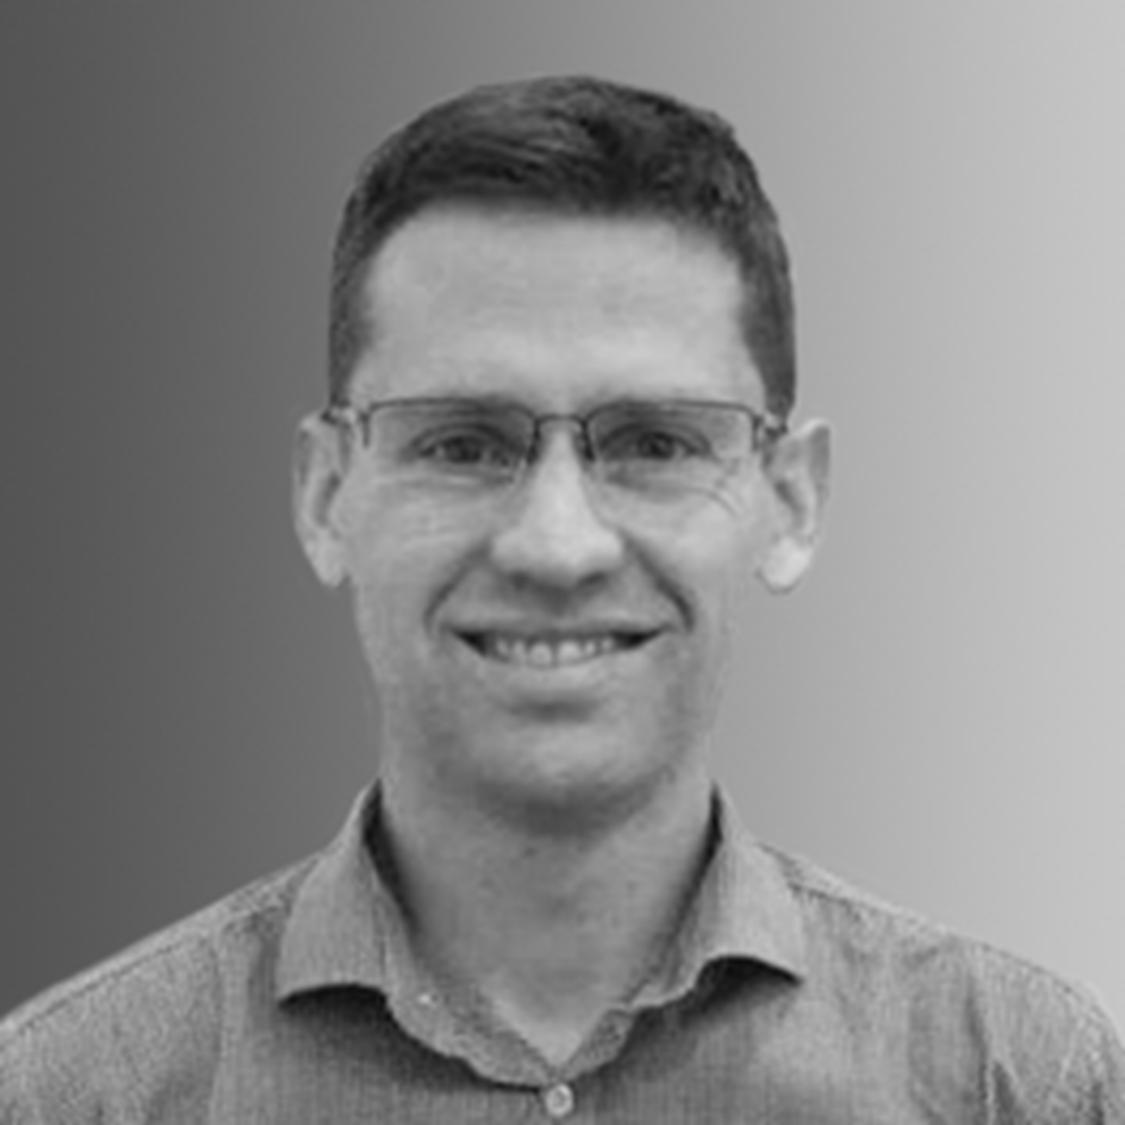 Daniel Abetz